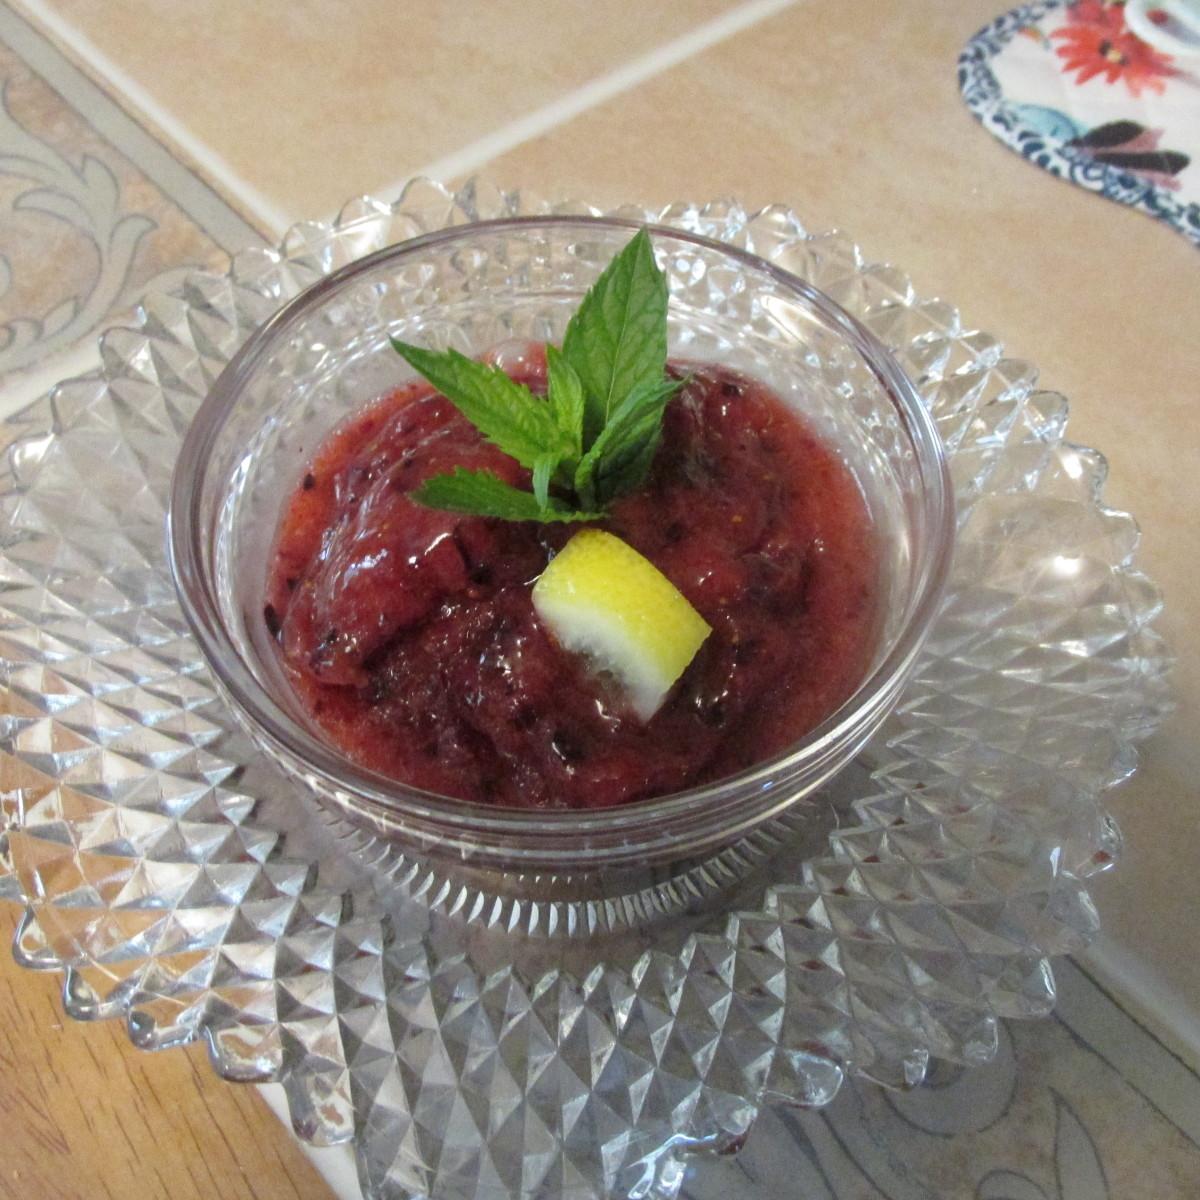 How to Make Fresh Fruit Sorbet